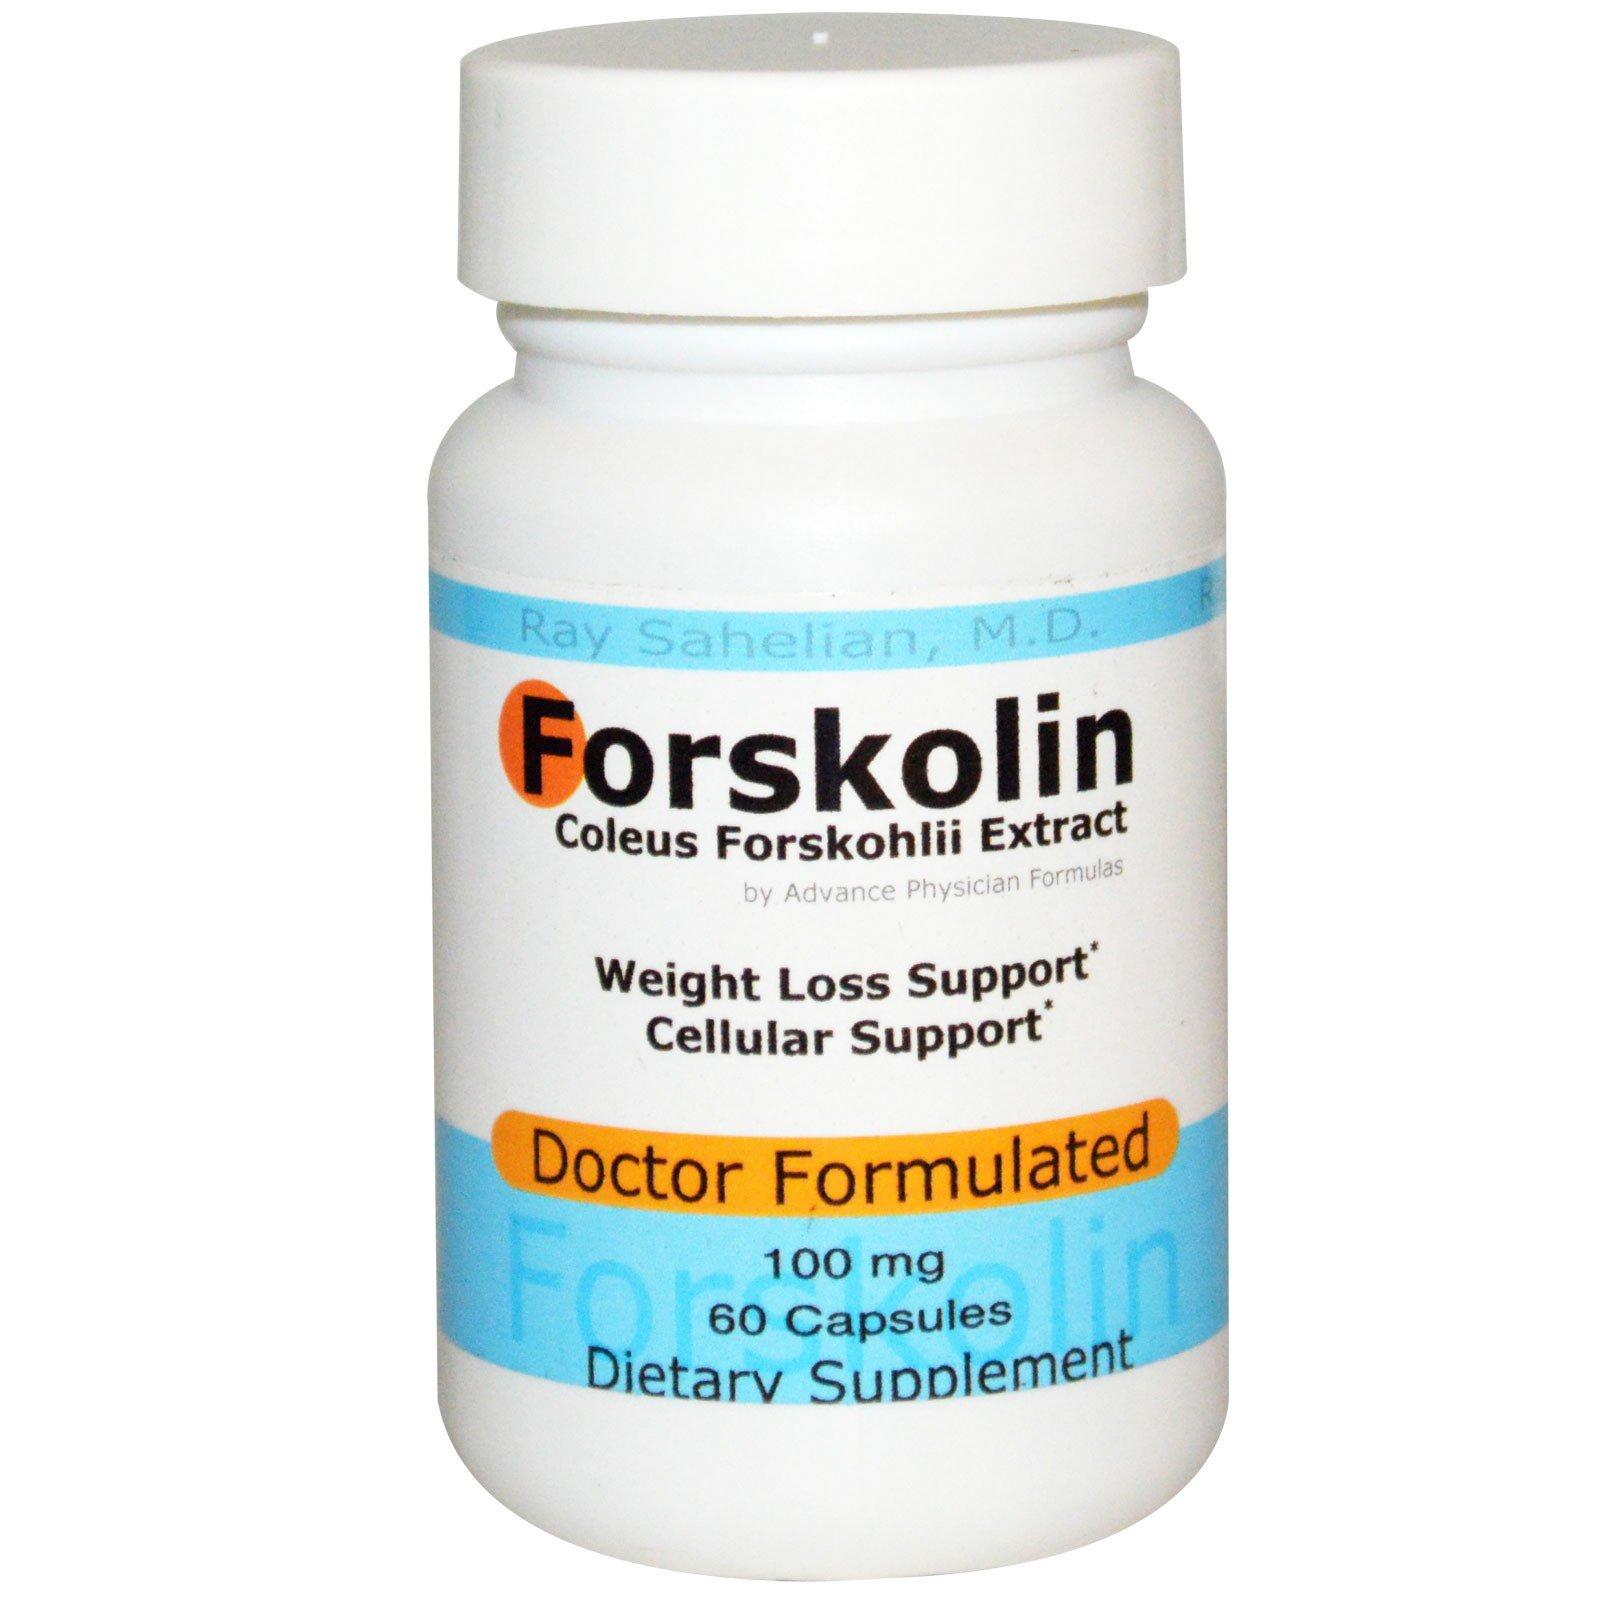 Advance Physician Formulas, Inc., Форсколин - экстракт корня колеус форсколии, 100 мг, 60 капсул